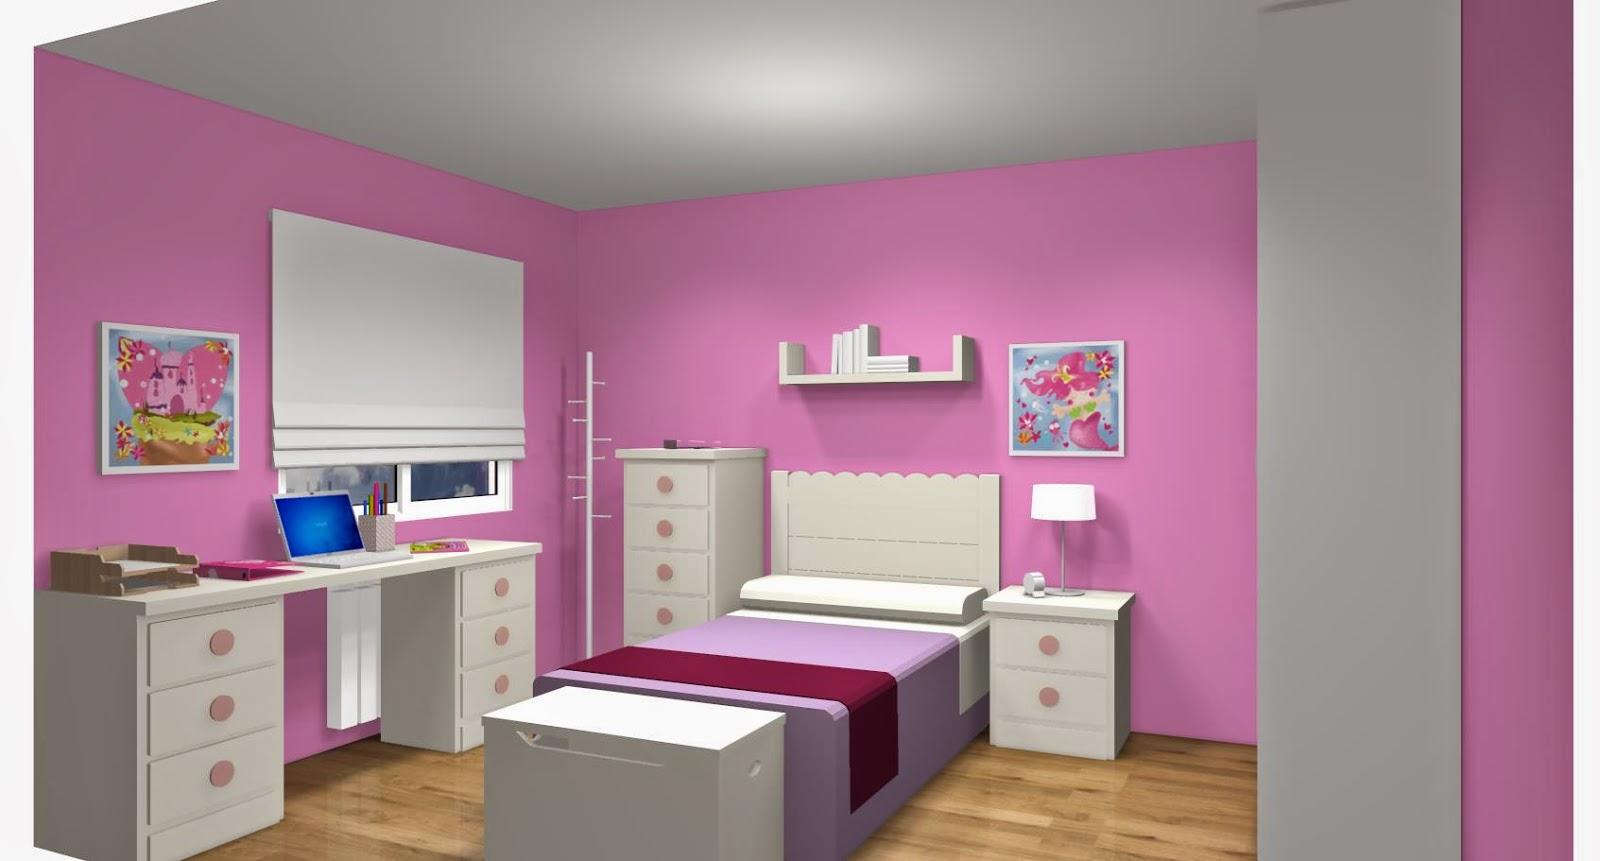 Dise o de cuartos o dormitorios juveniles - Habitaciones infantiles ninos 4 anos ...